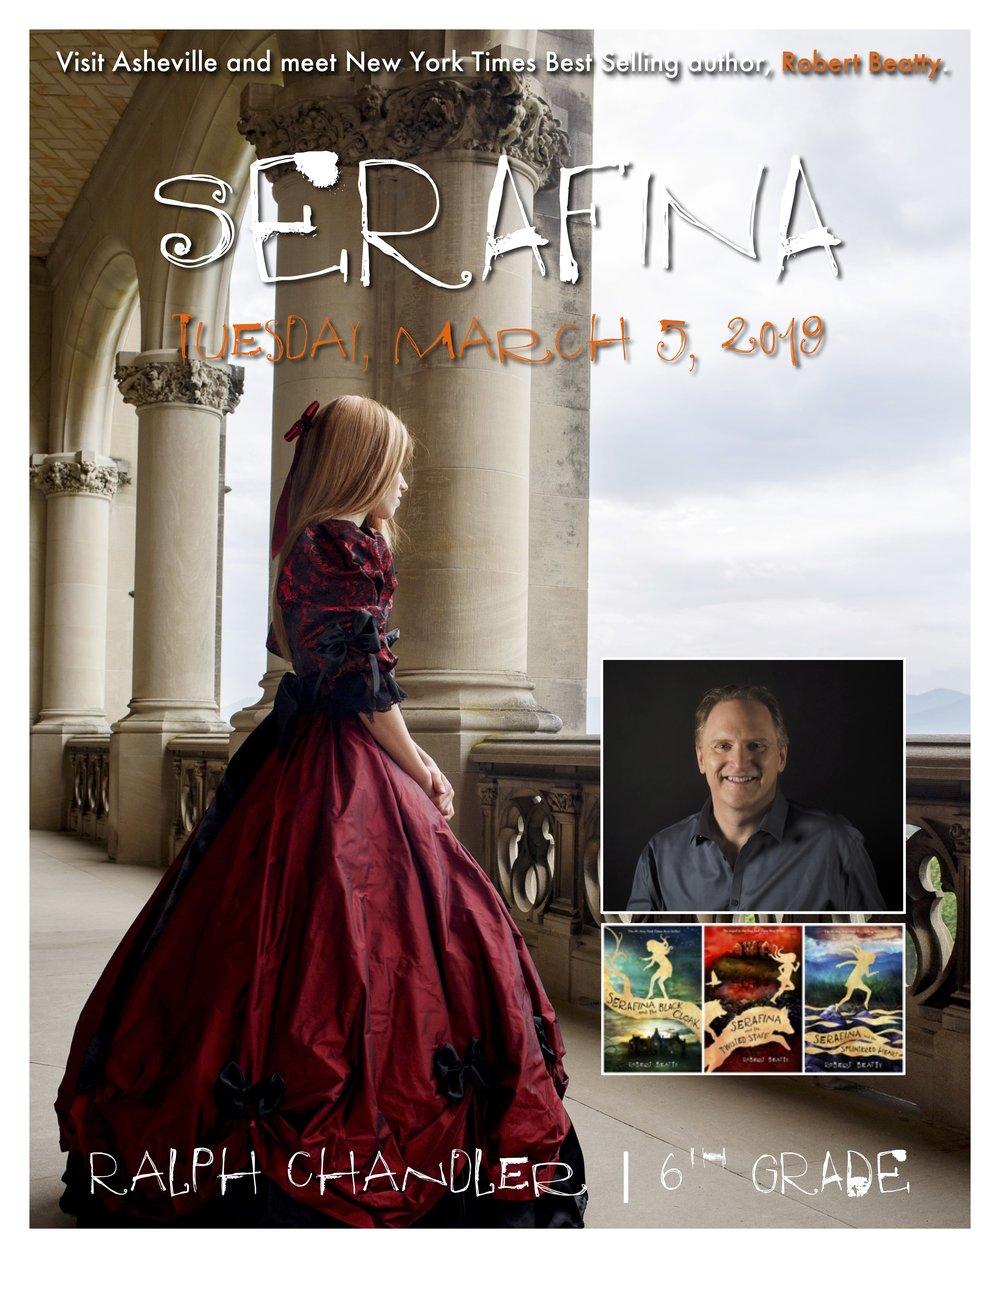 Ralph Chandler MS 6th Grade - Serafina 2019 Flyer (dragged).jpg